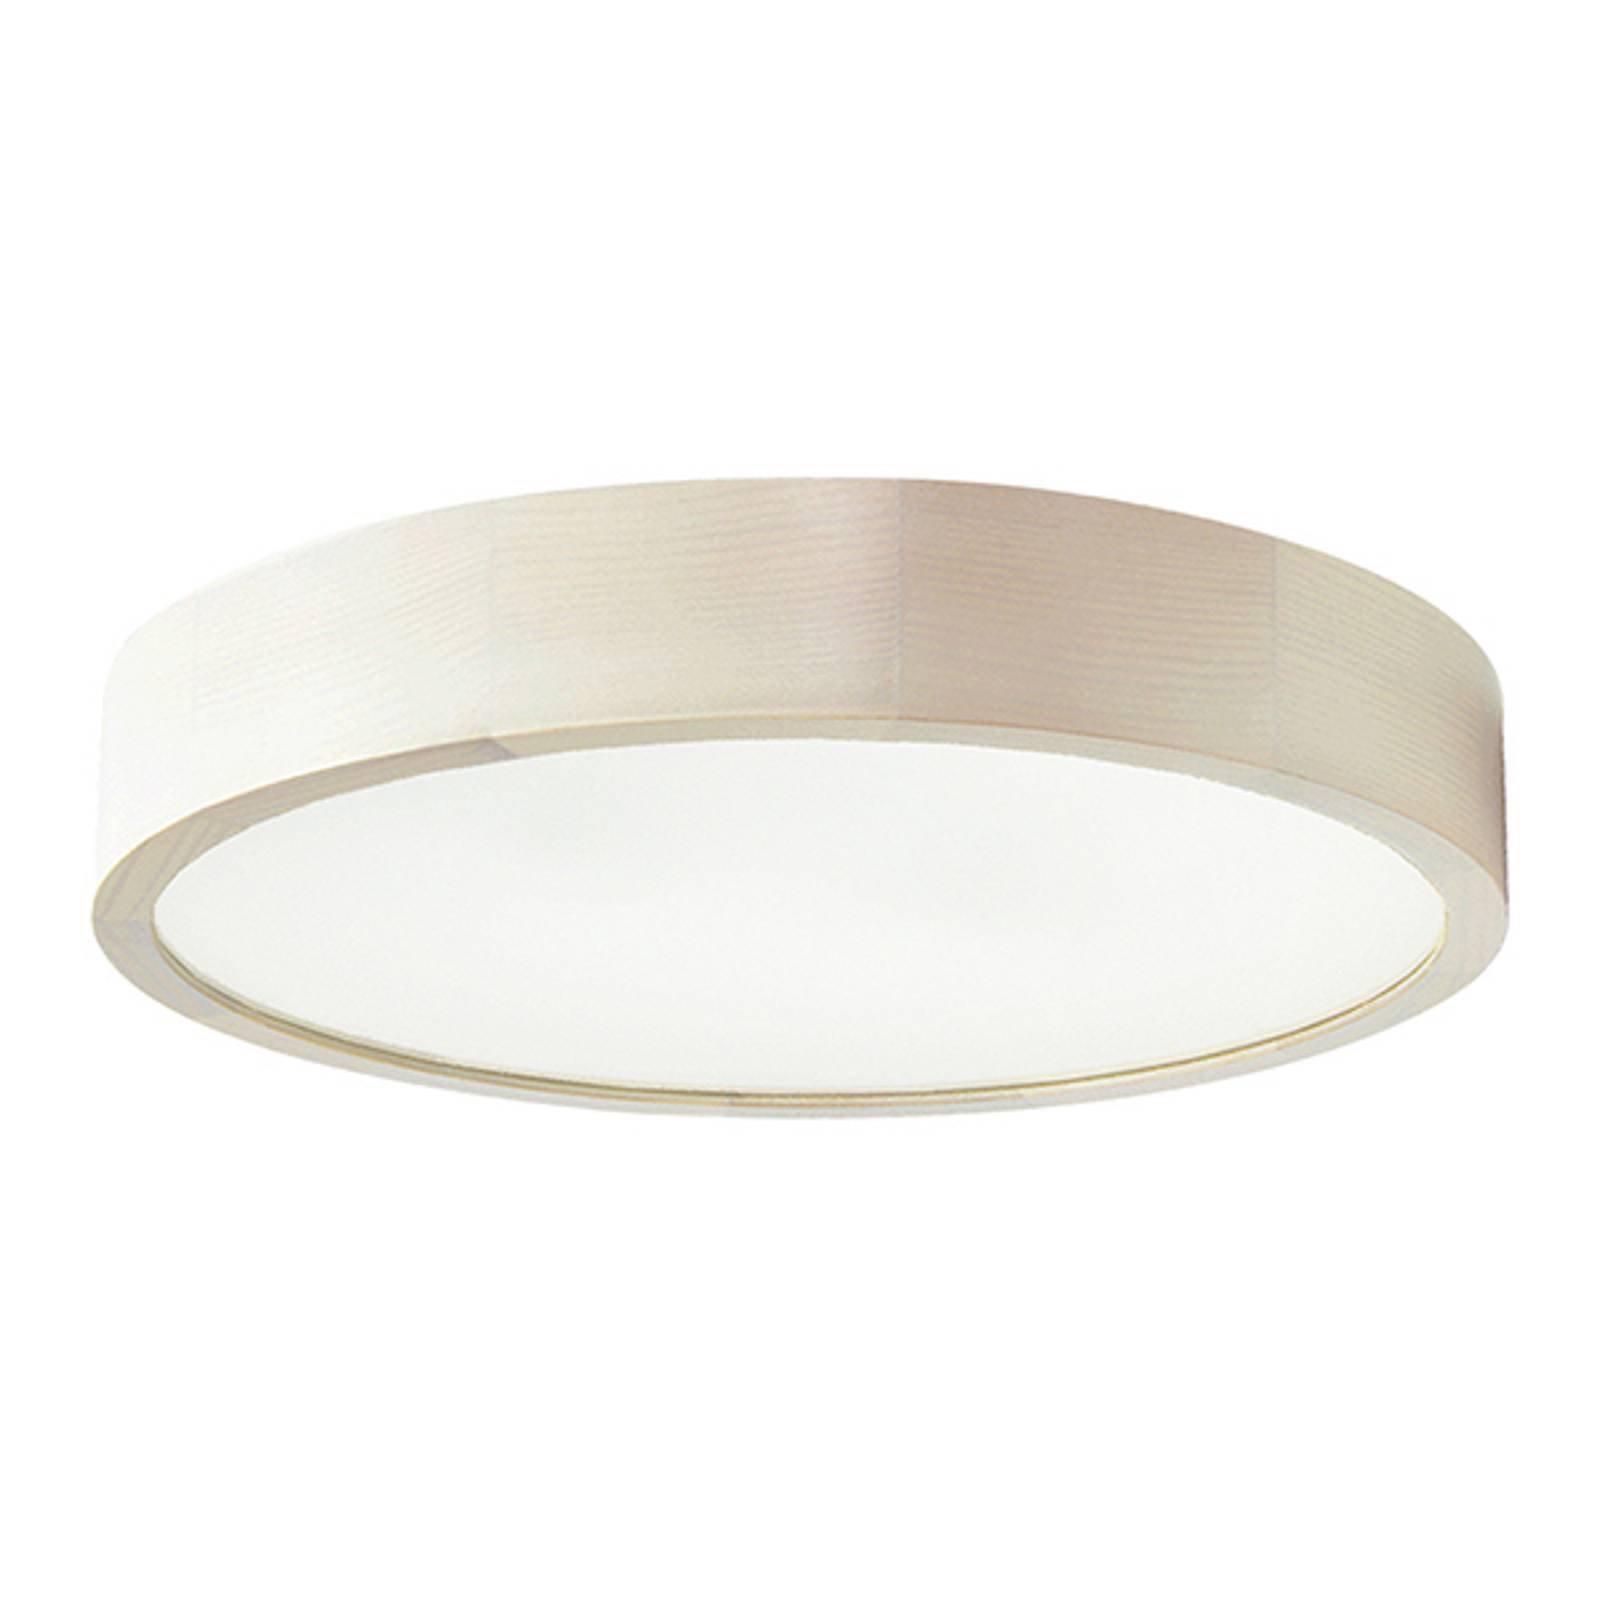 LED-taklampe Cleo, Ø 48 cm, hvit